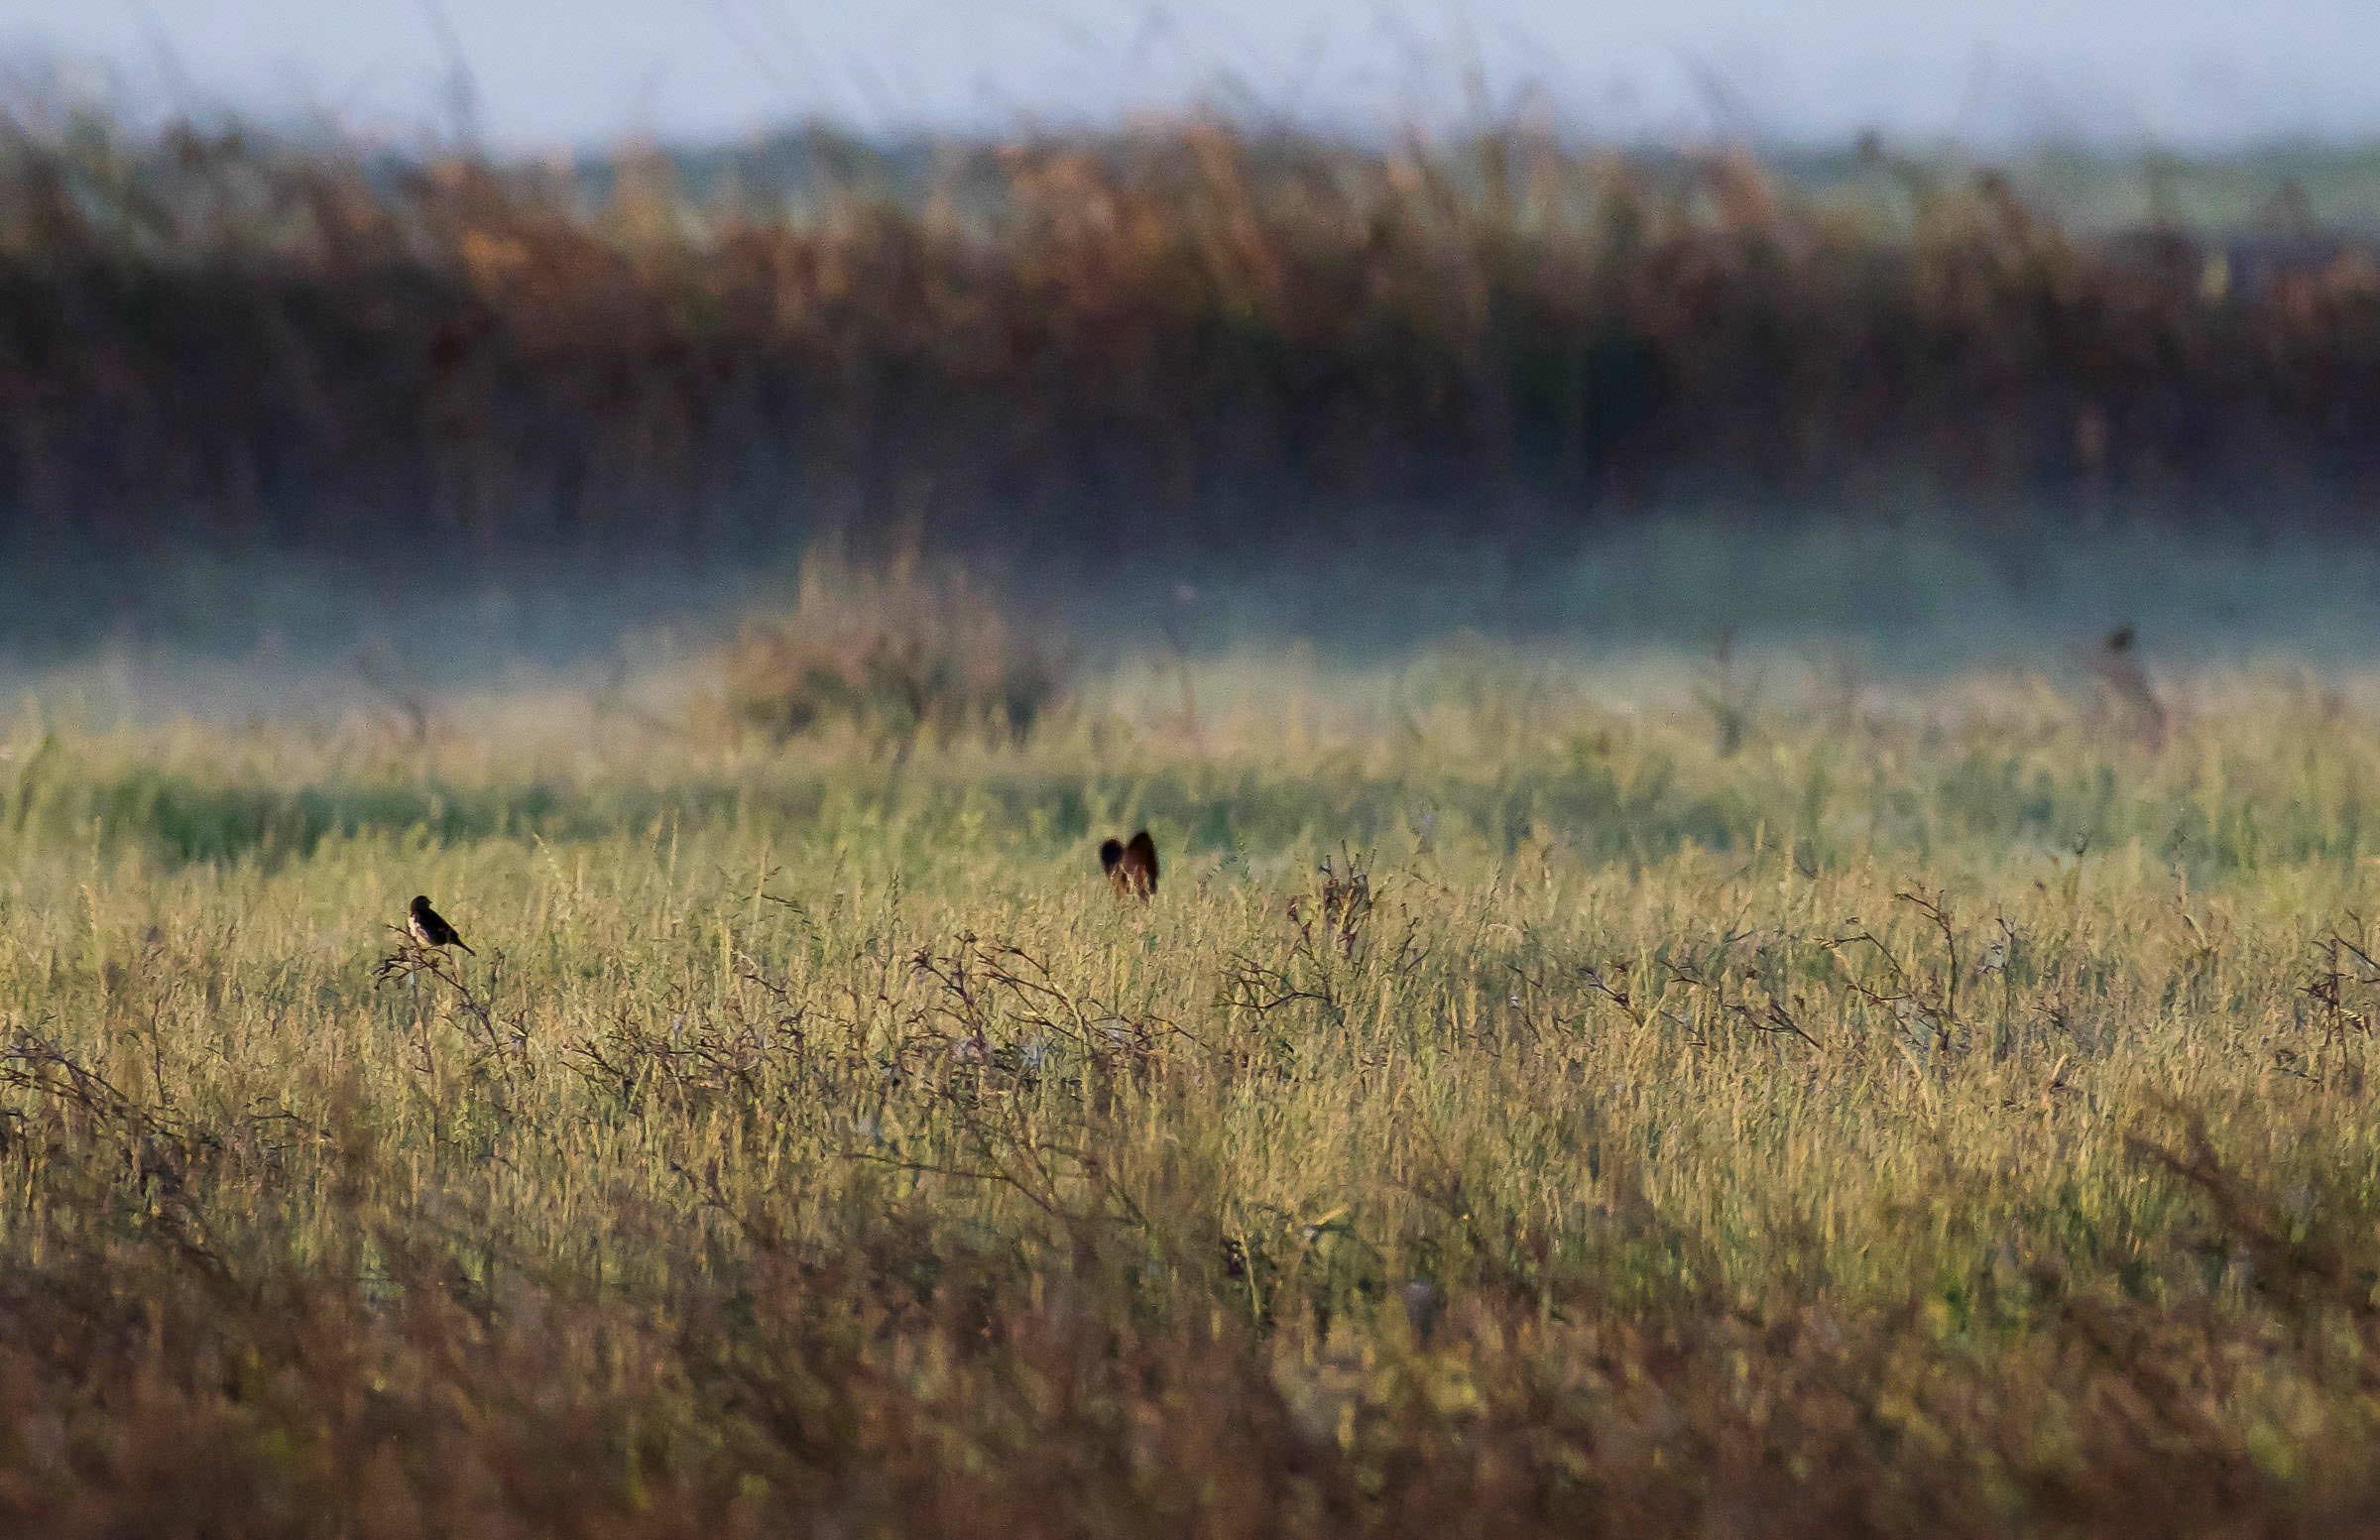 northern_harrier_hunting_jackrabbit-5.jpg